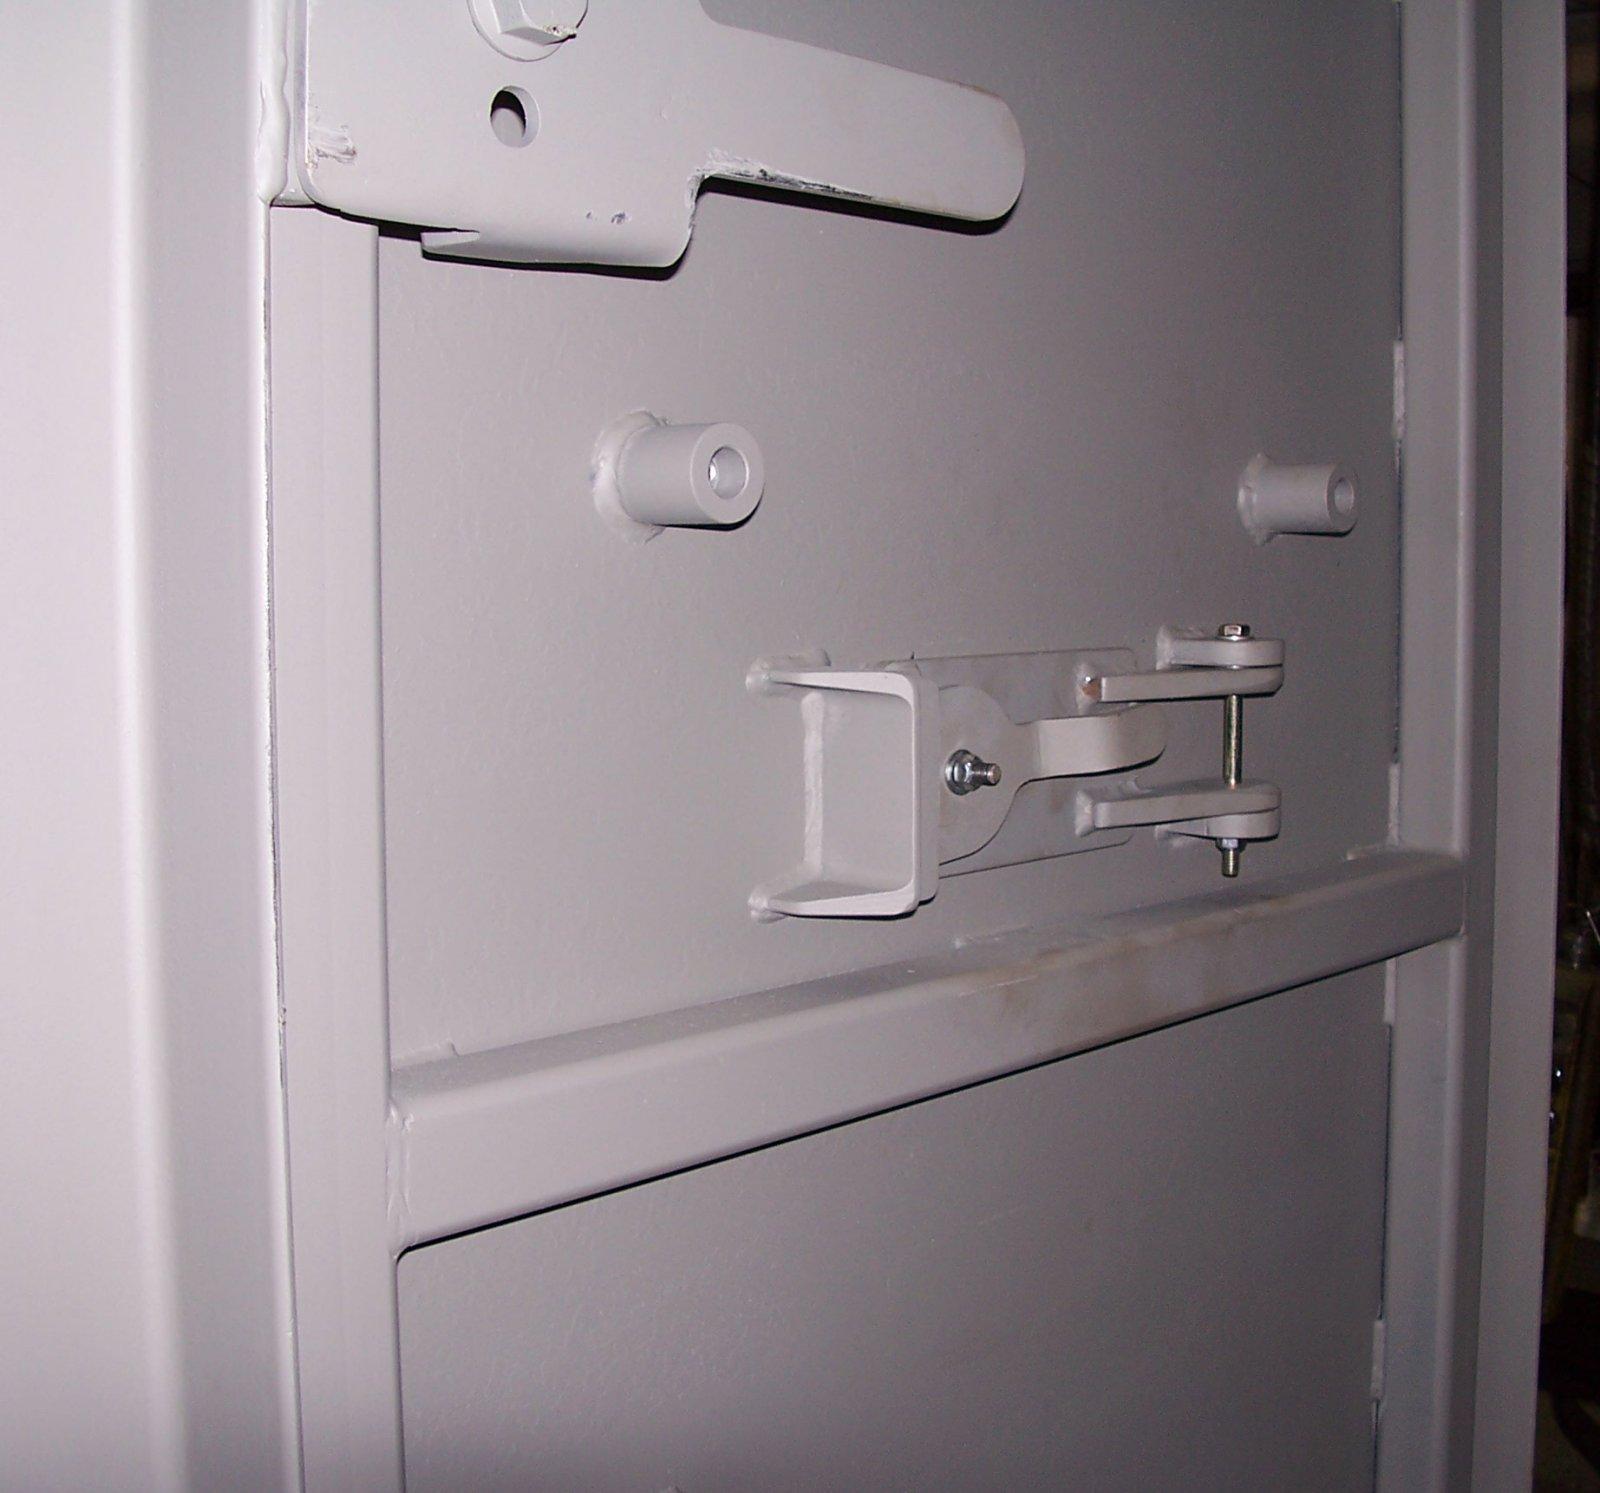 Latches on a ballistic door